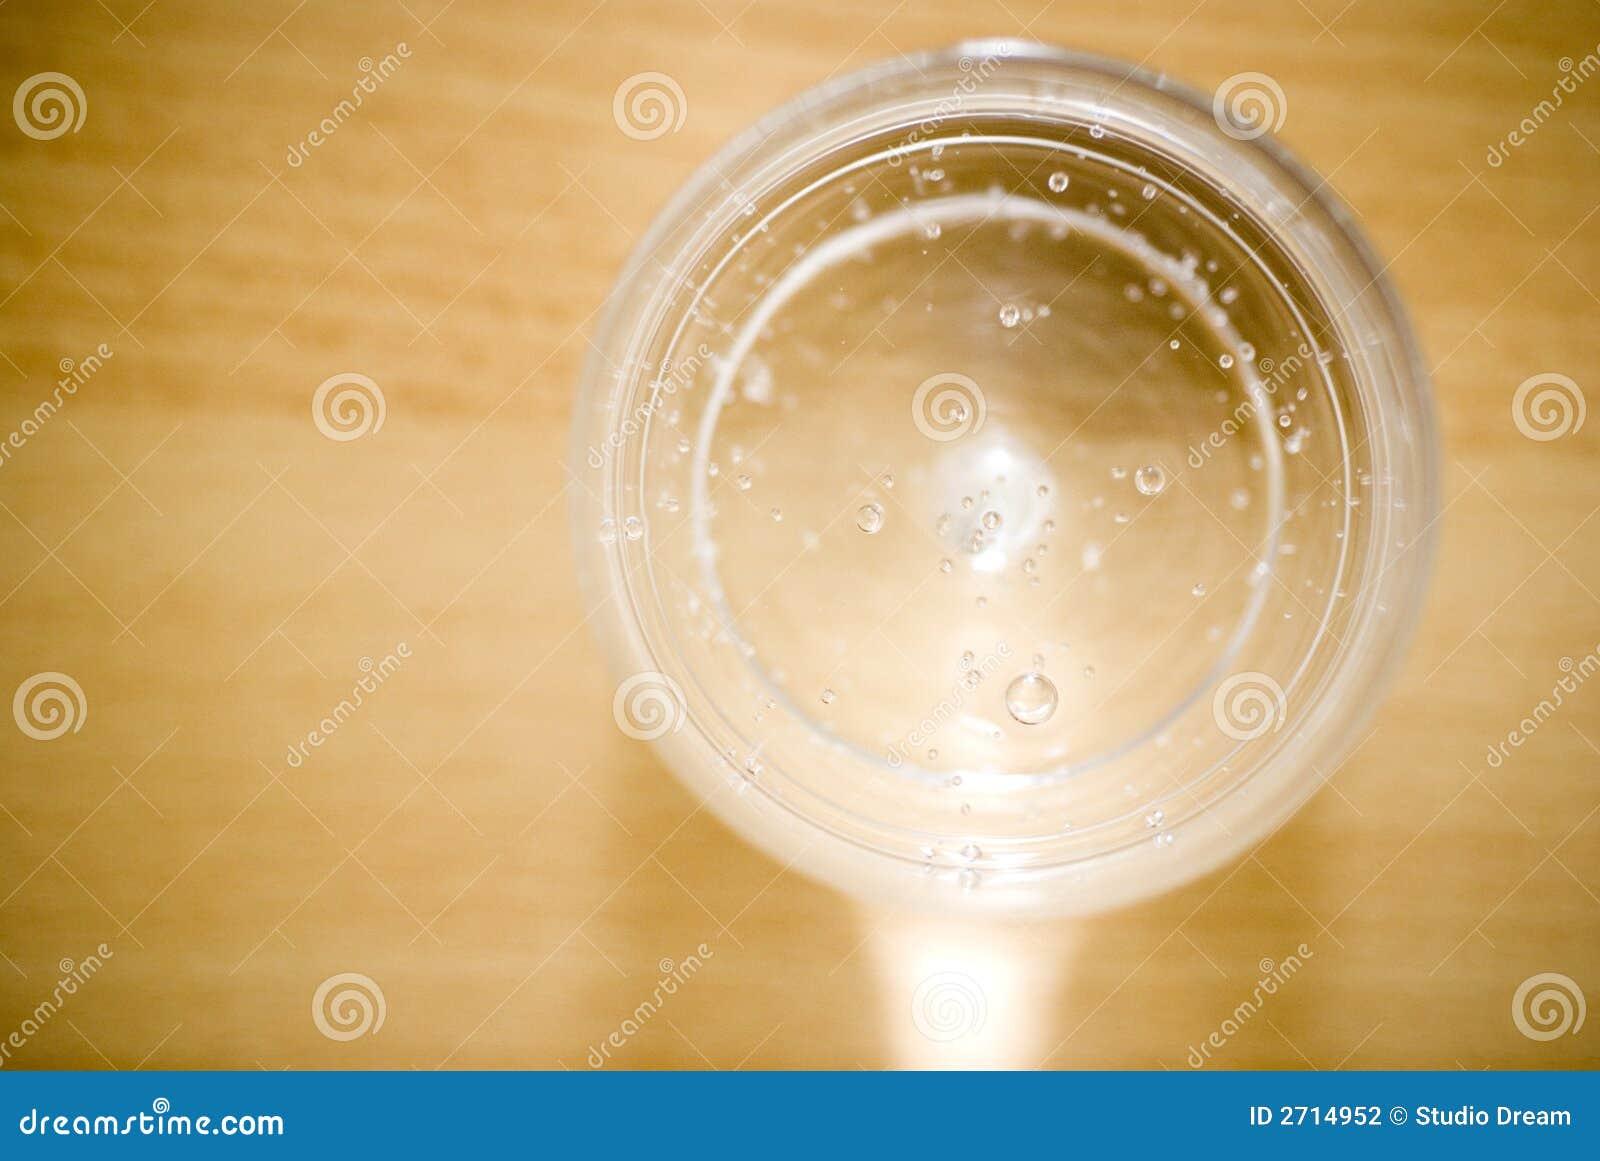 Kop van sodawater